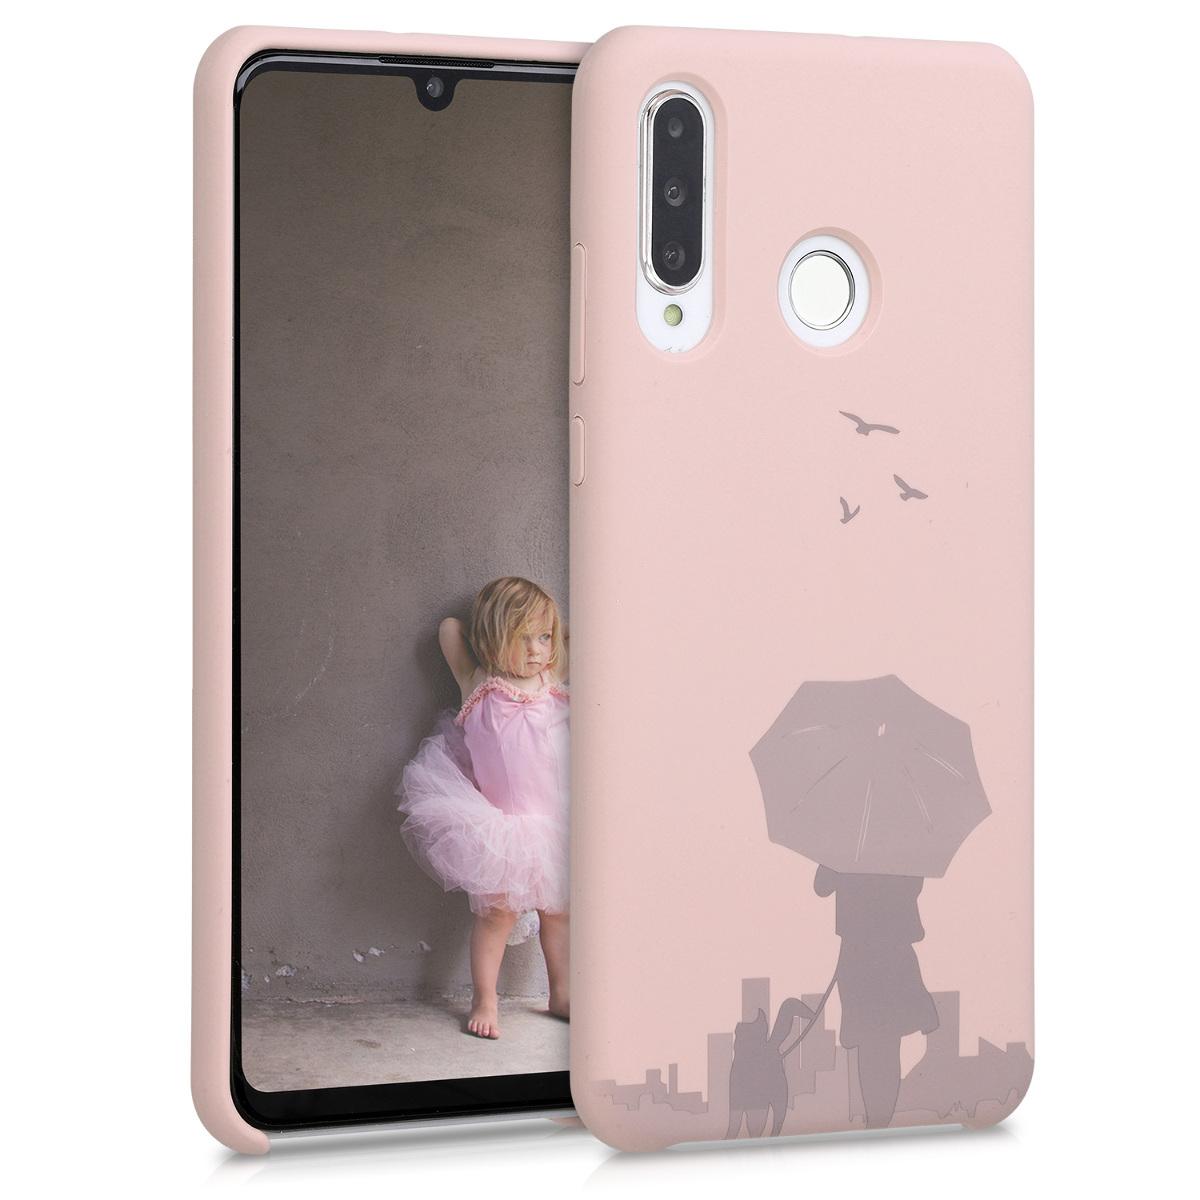 KW Θήκη Σιλικόνης Huawei P30 Lite - Laser Engraved Umbrella Dusty Pink (51167.03)